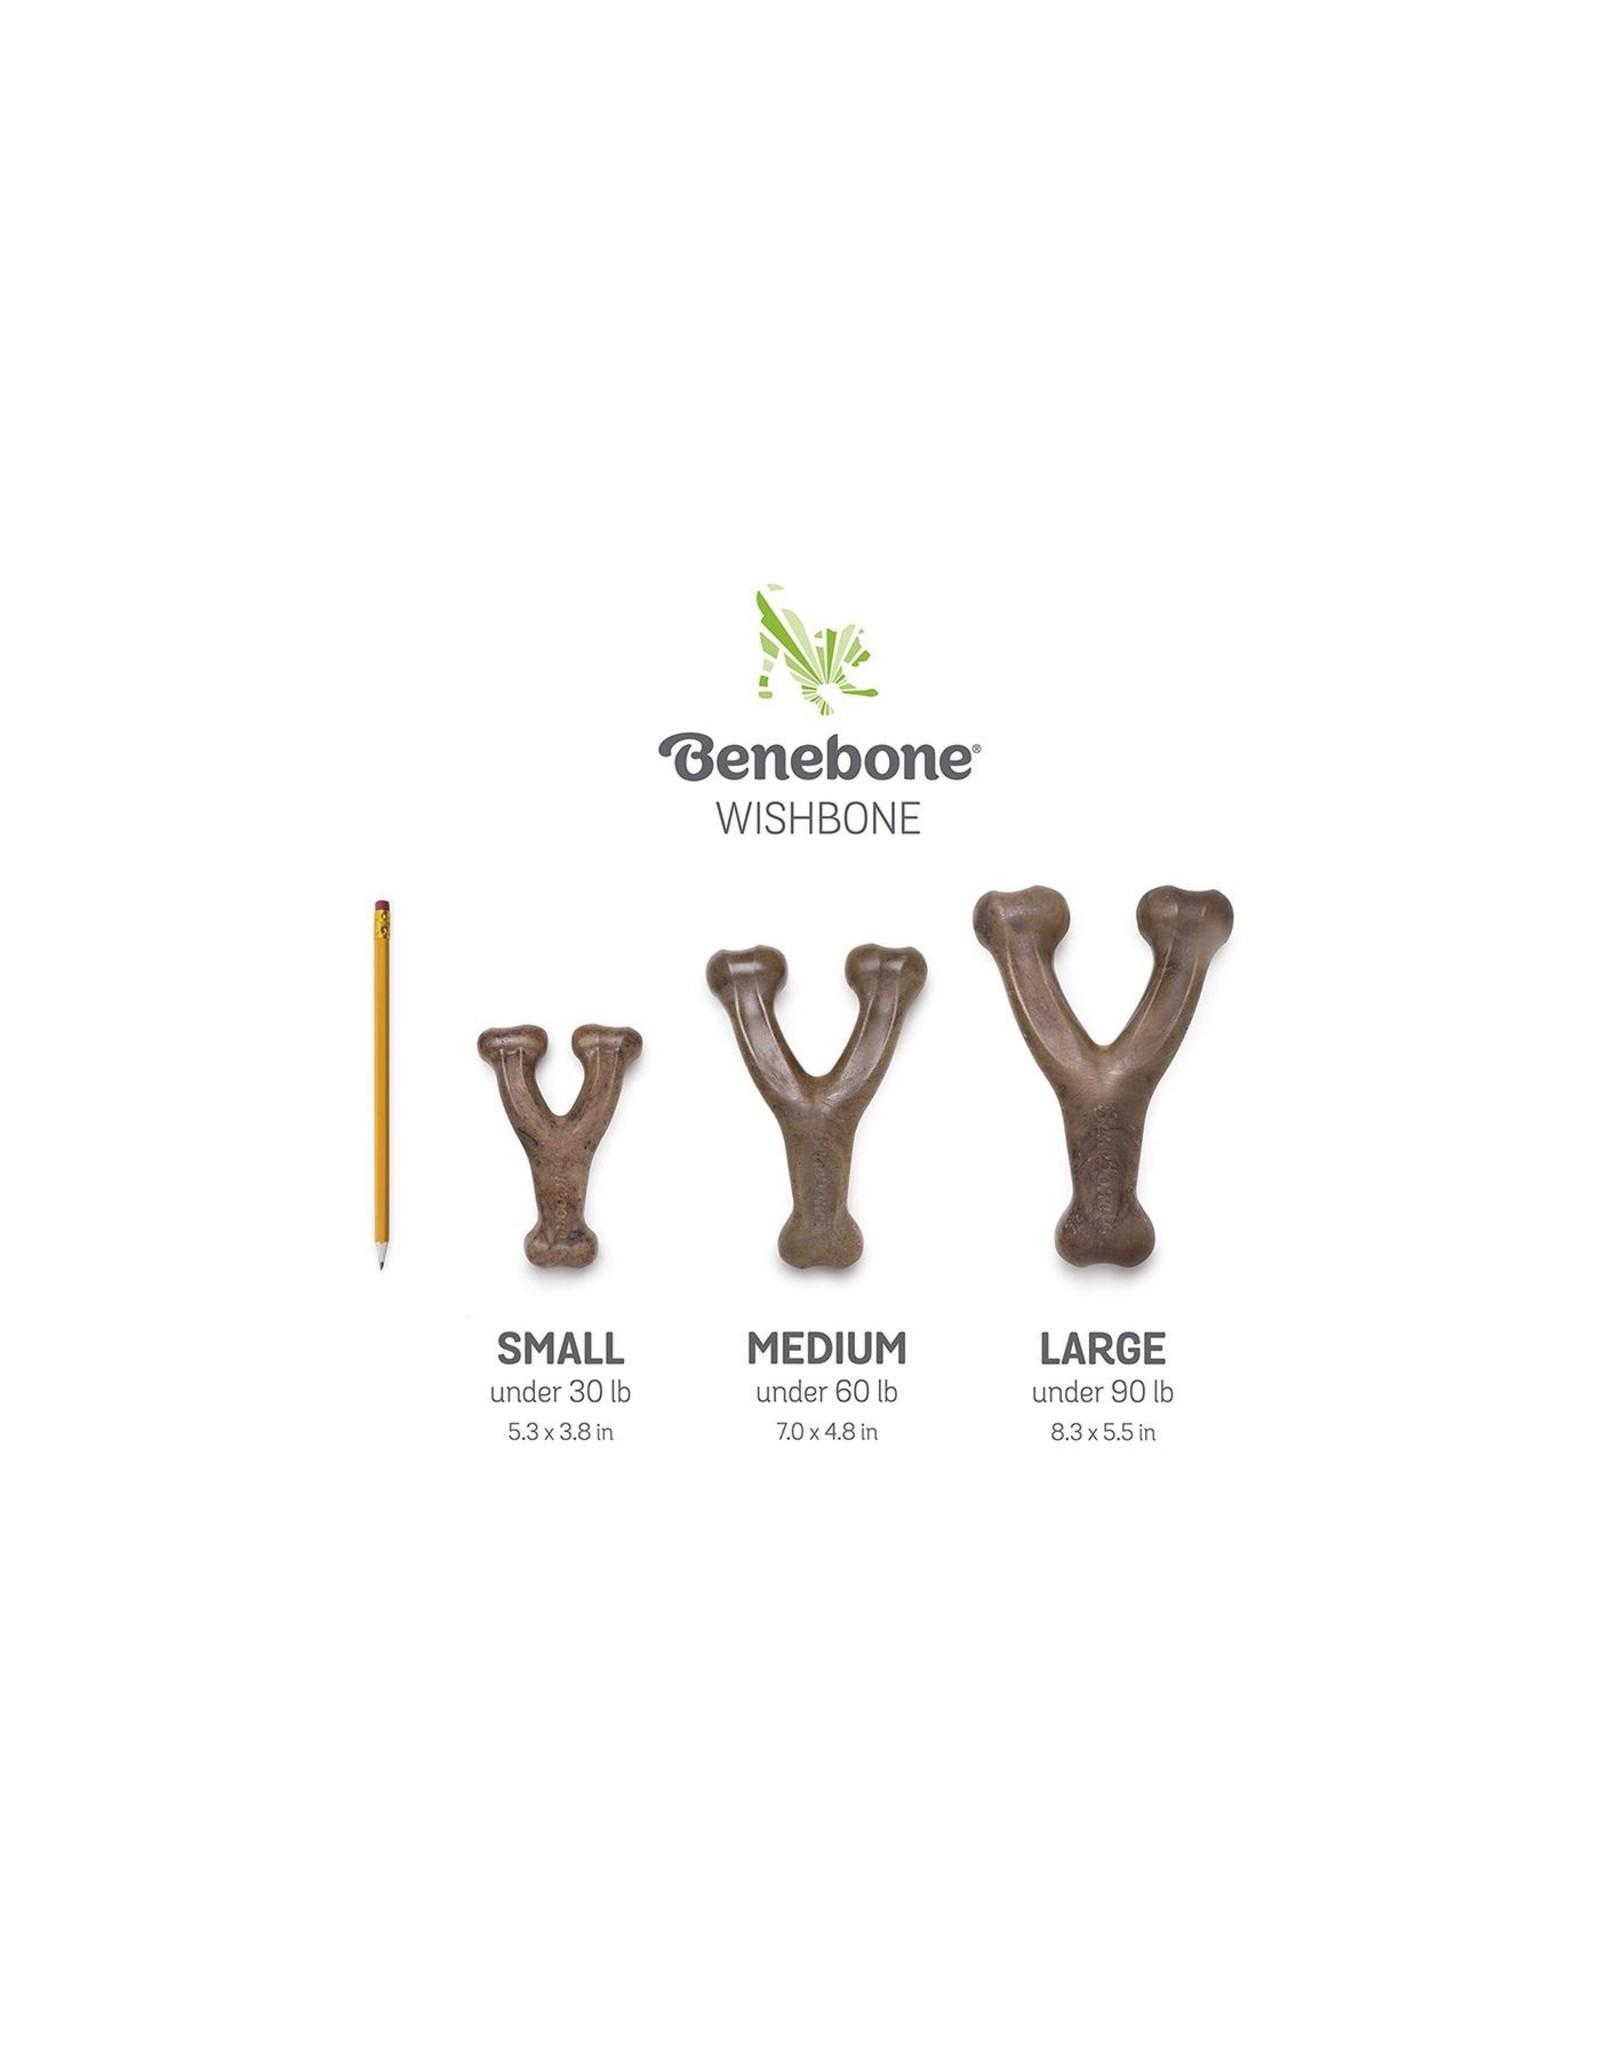 Benebone Benebone Wishbone Peanut Nylon Chew Toy